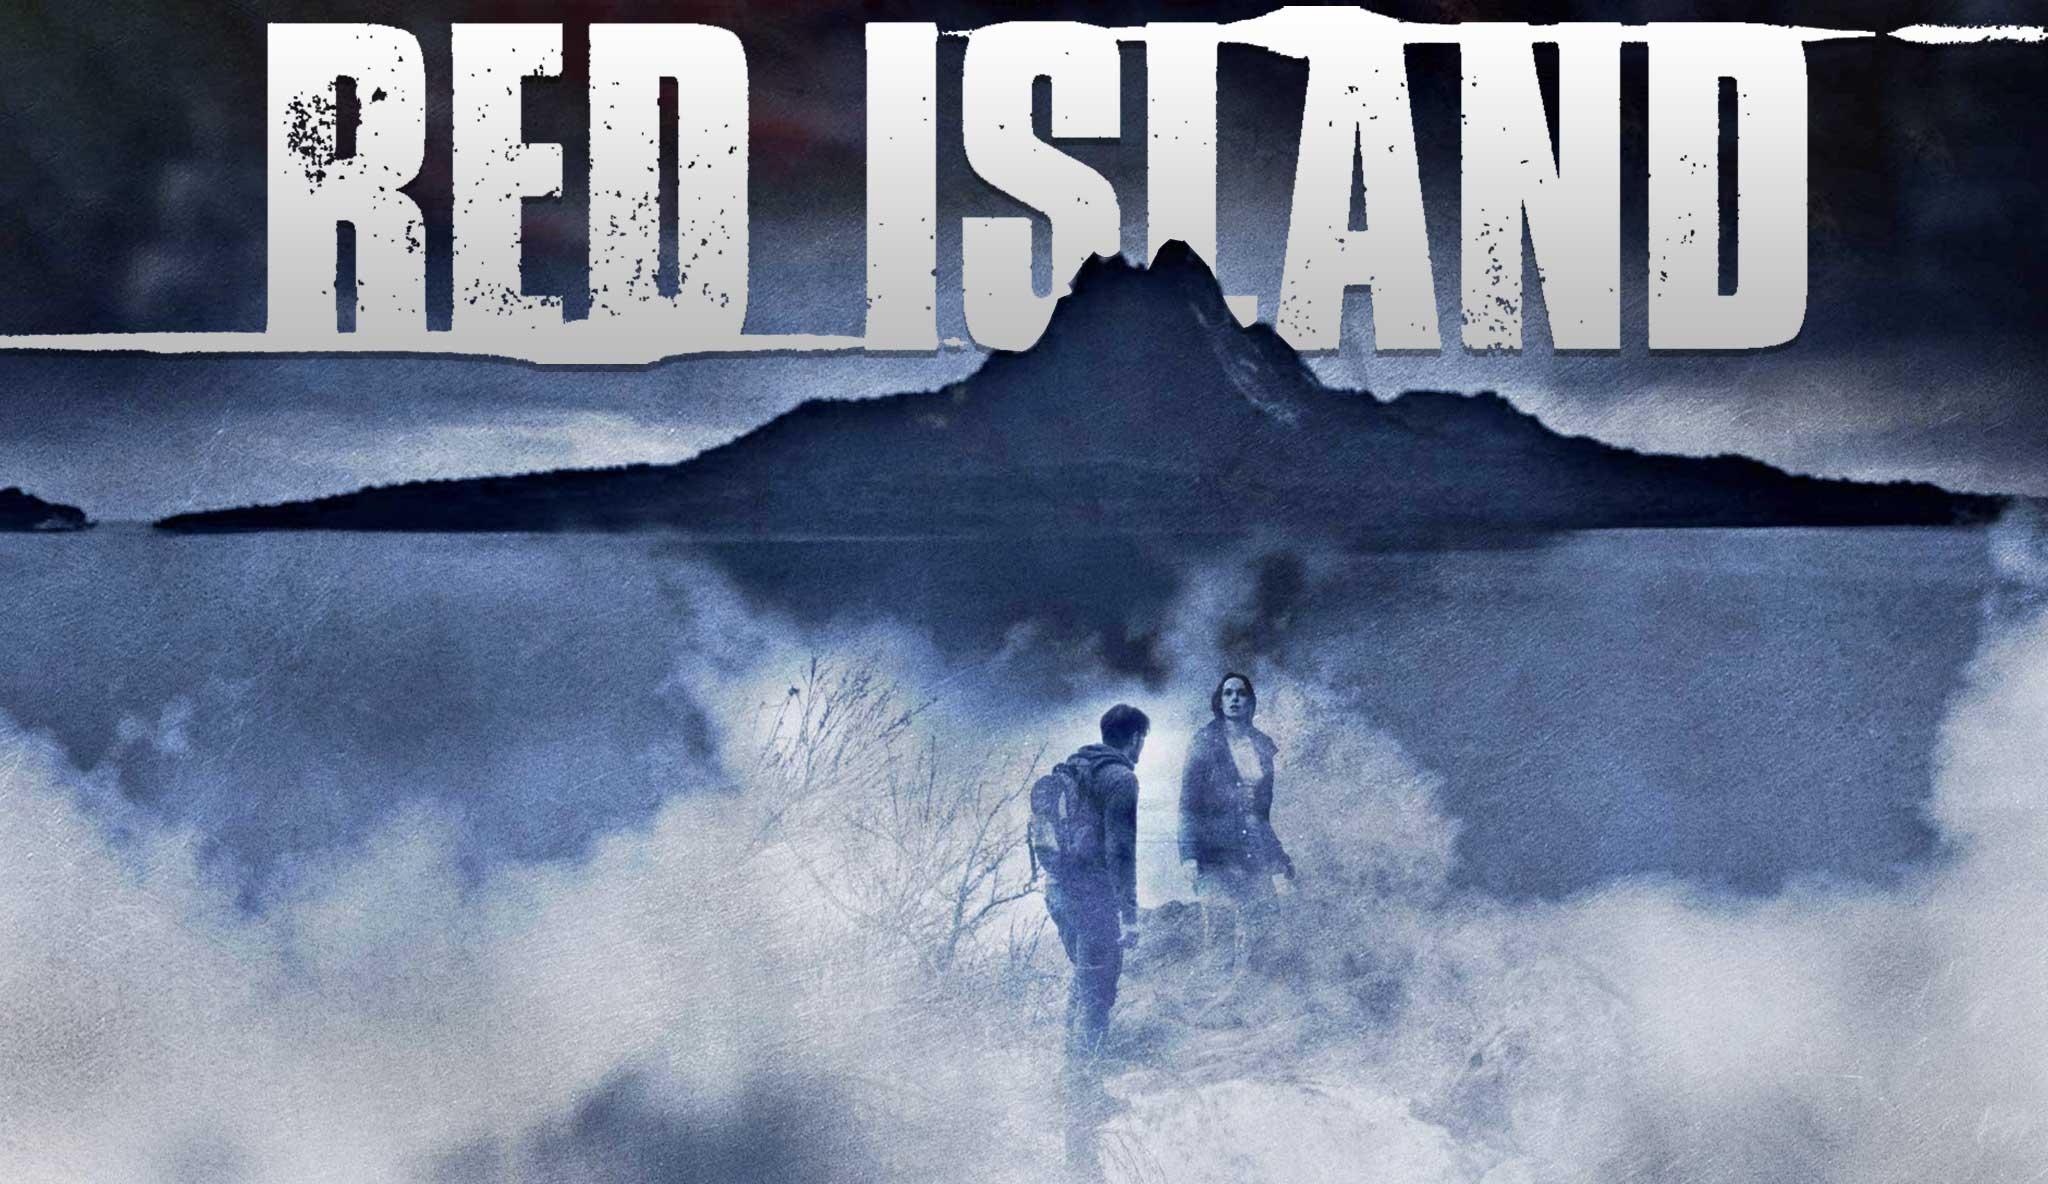 red-island\header.jpg